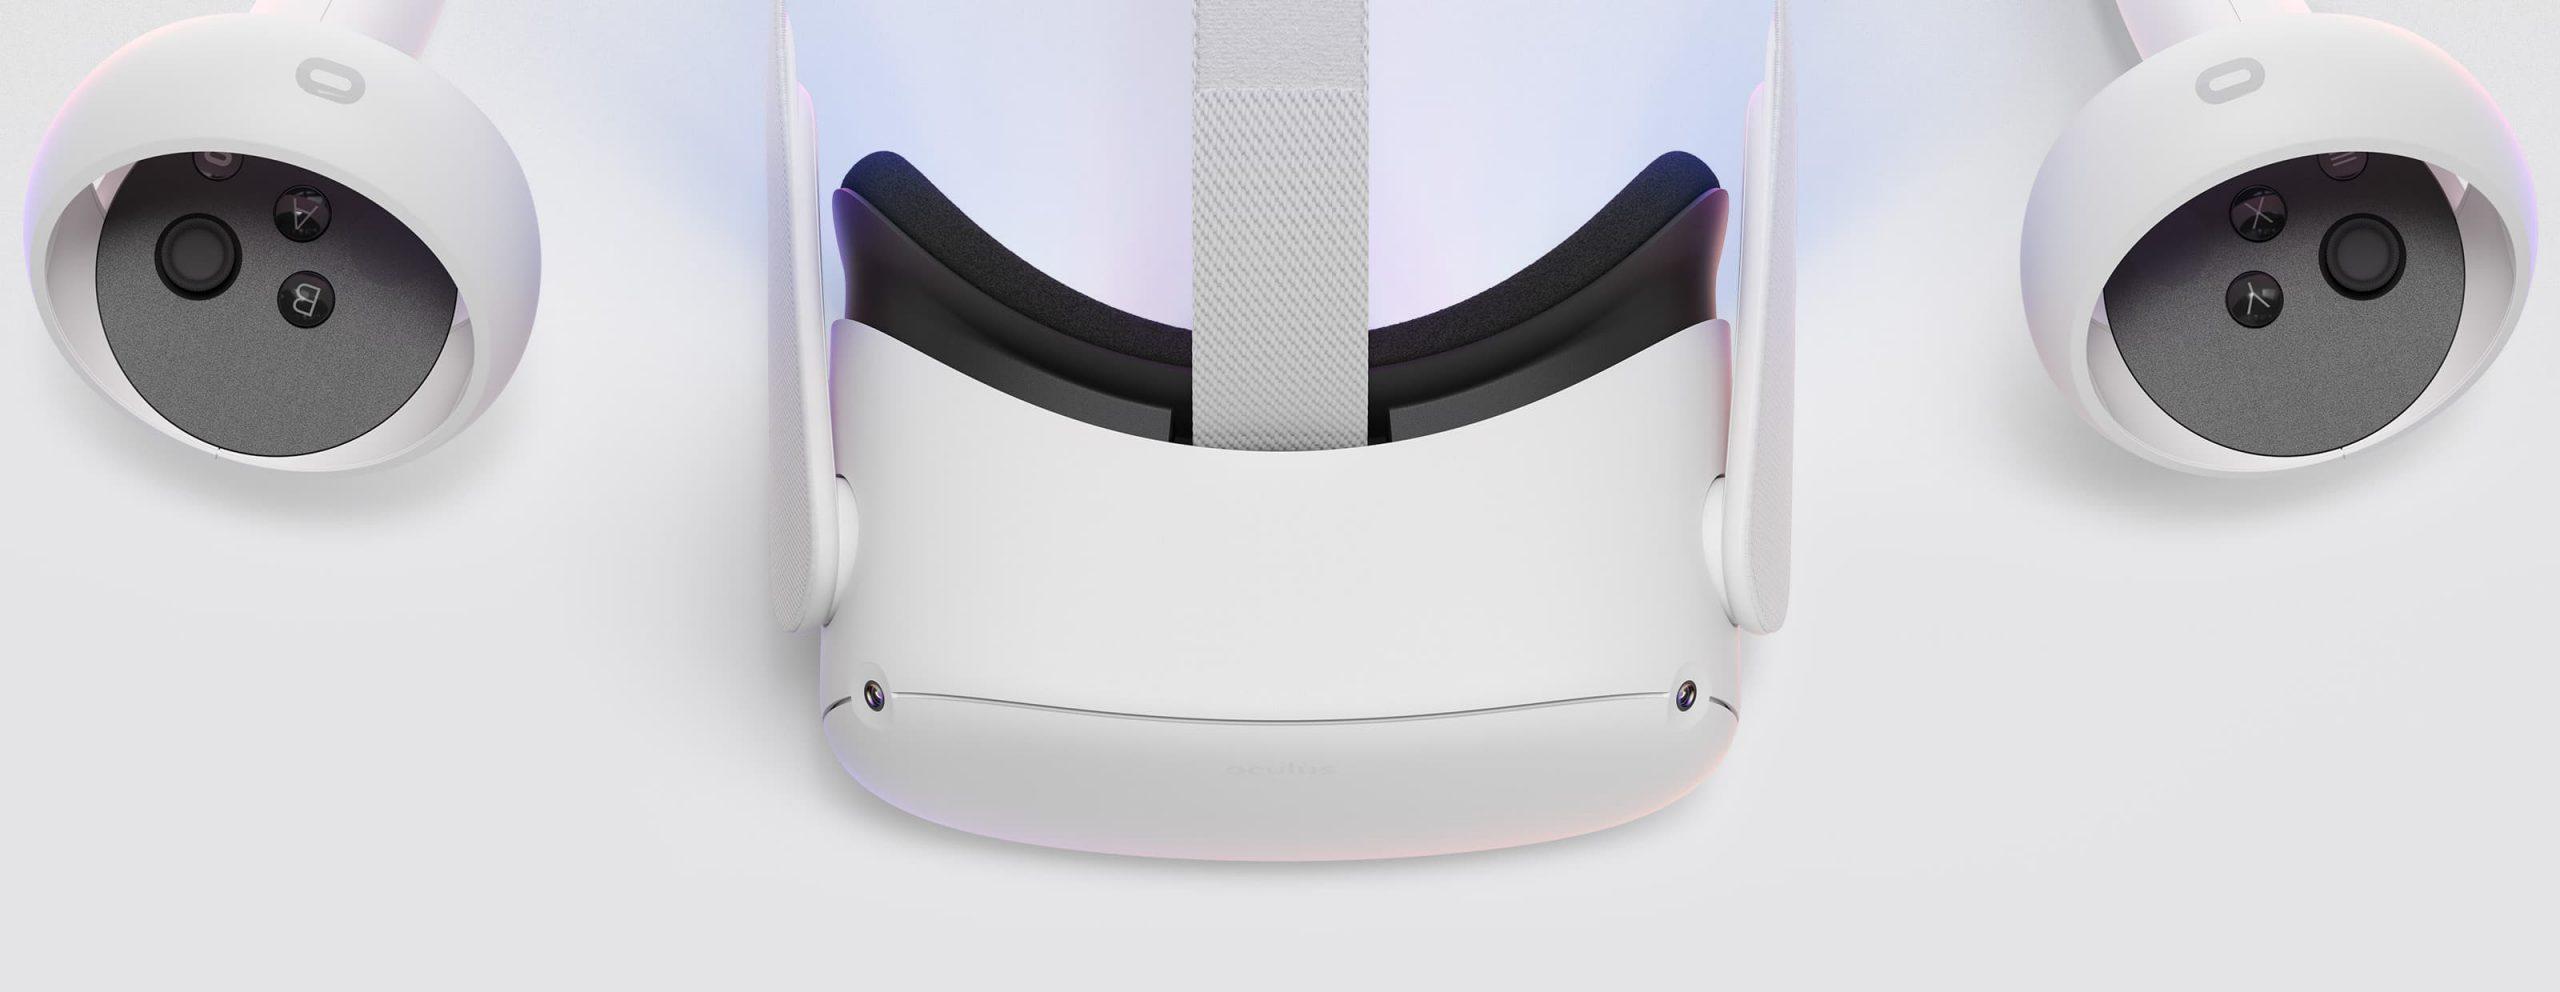 Oculus Quest 2 naočale